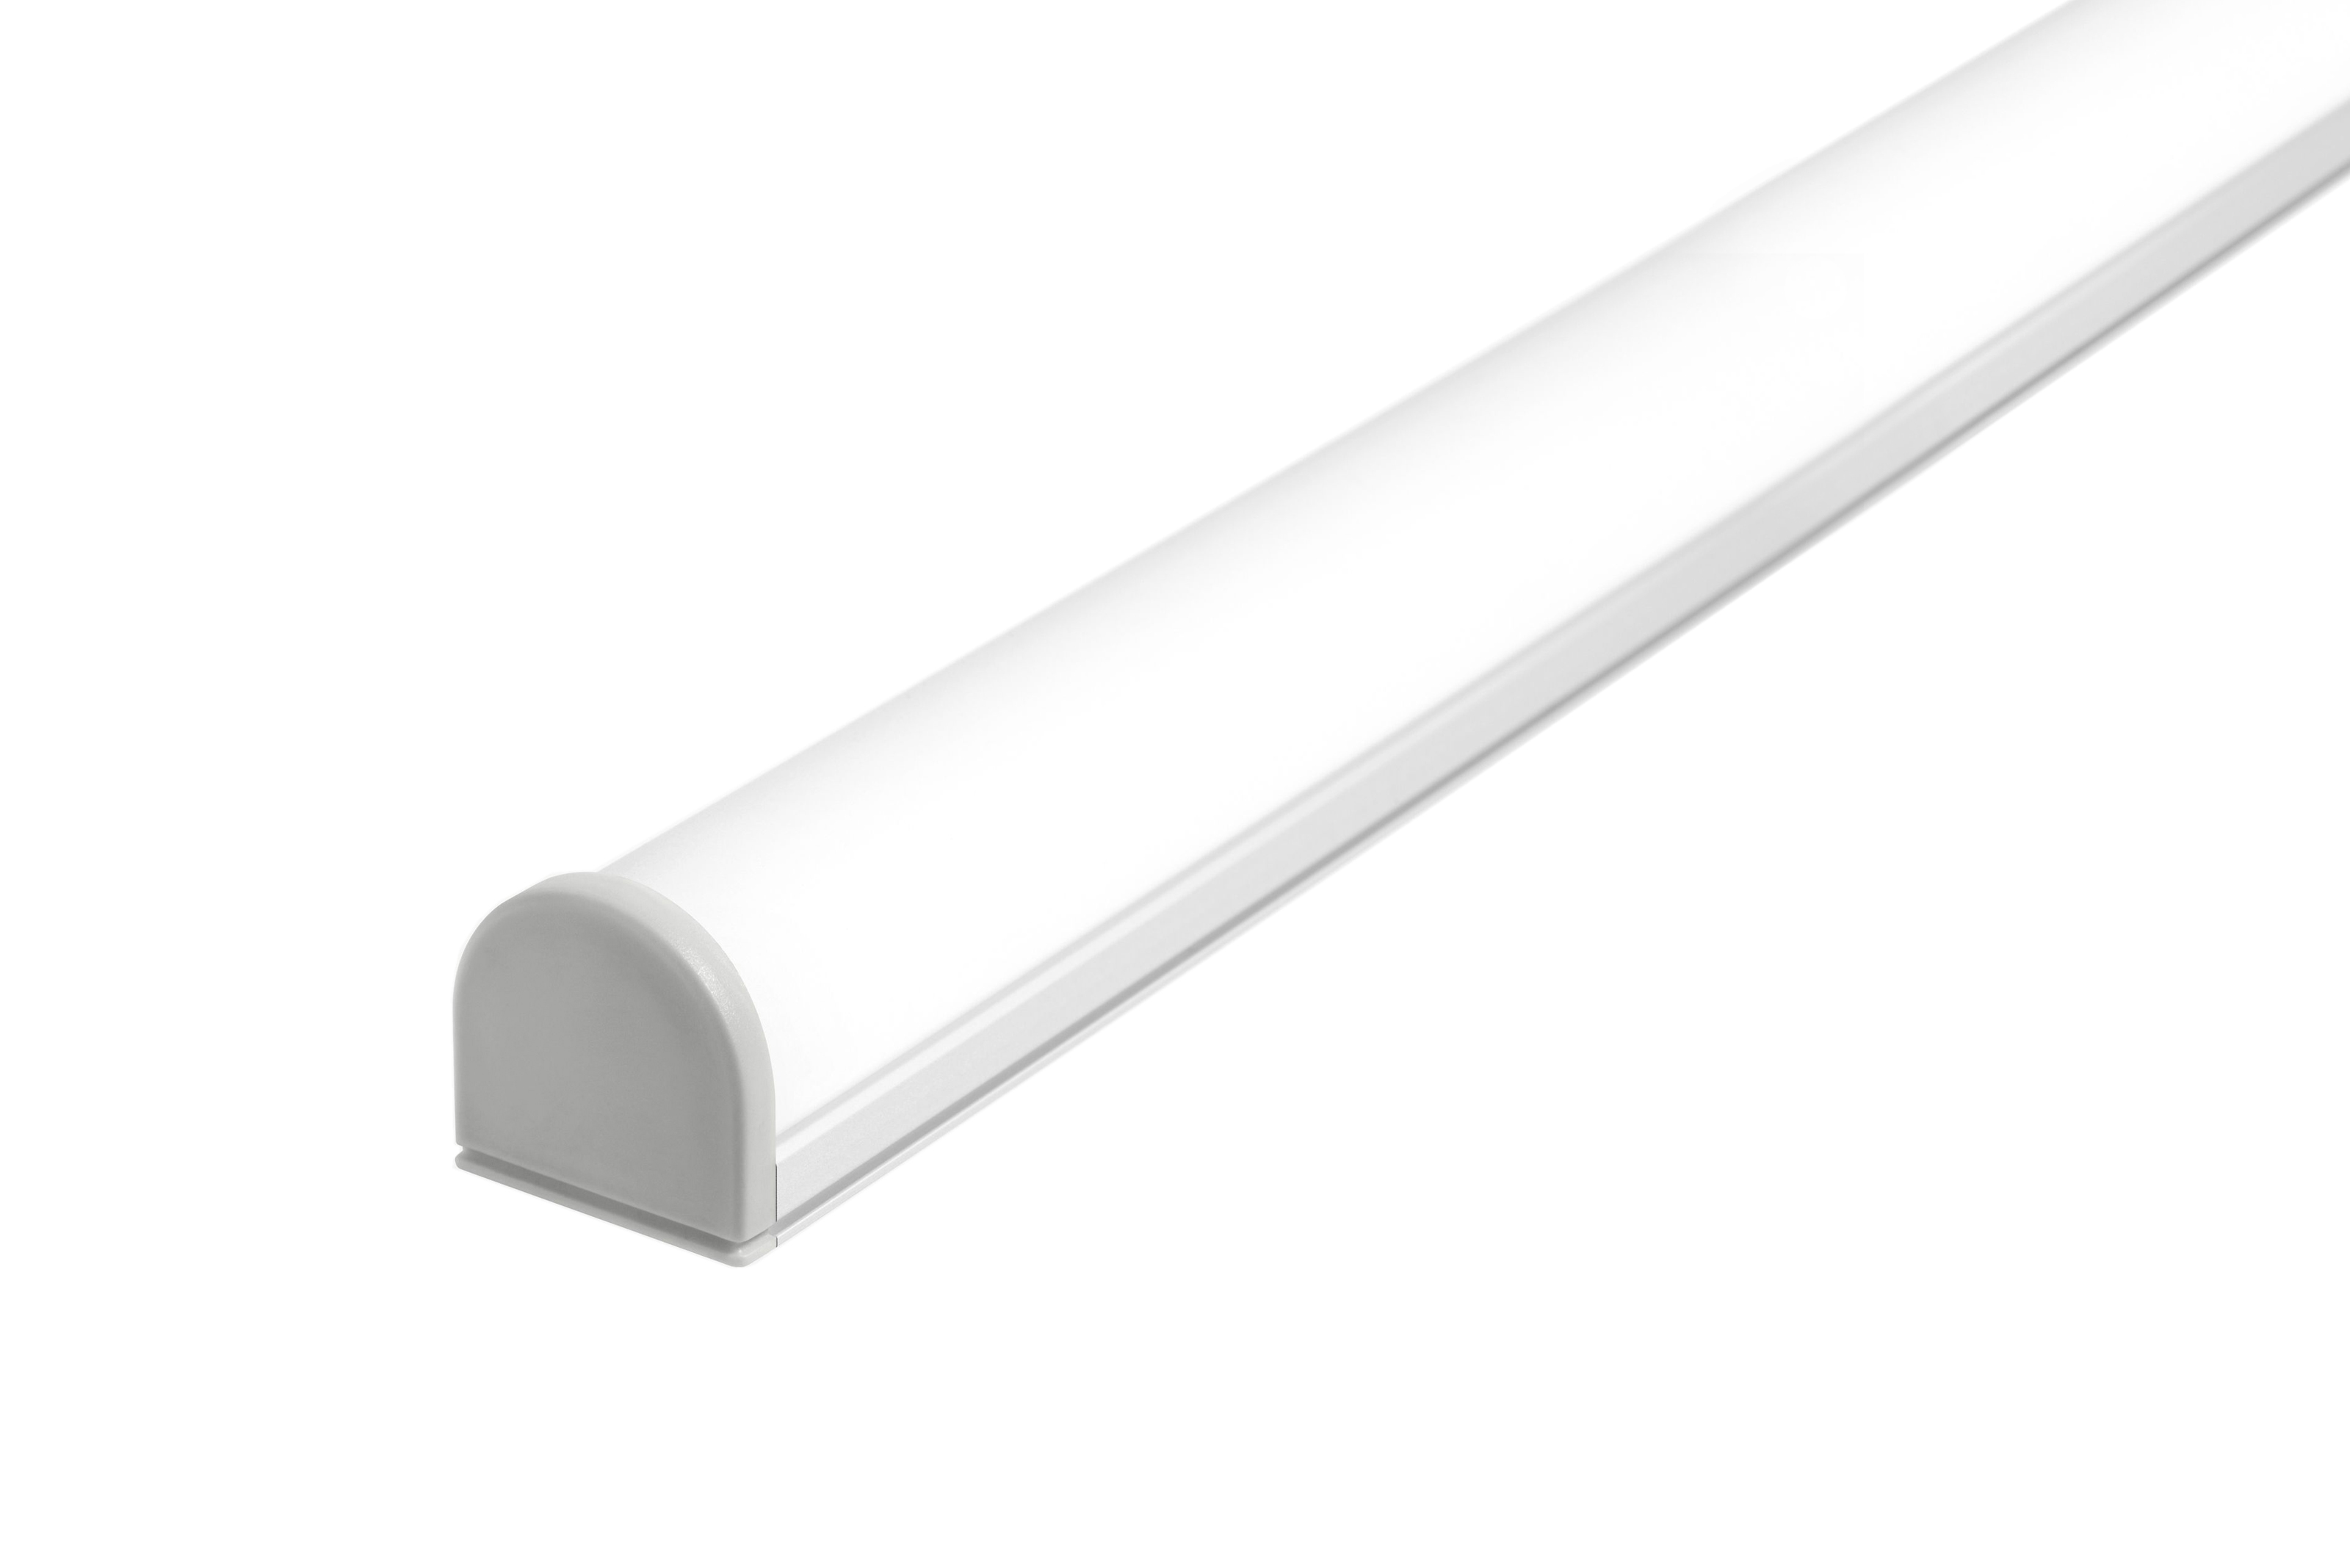 lightlline-grande-arch-1-mj-lighting-v2